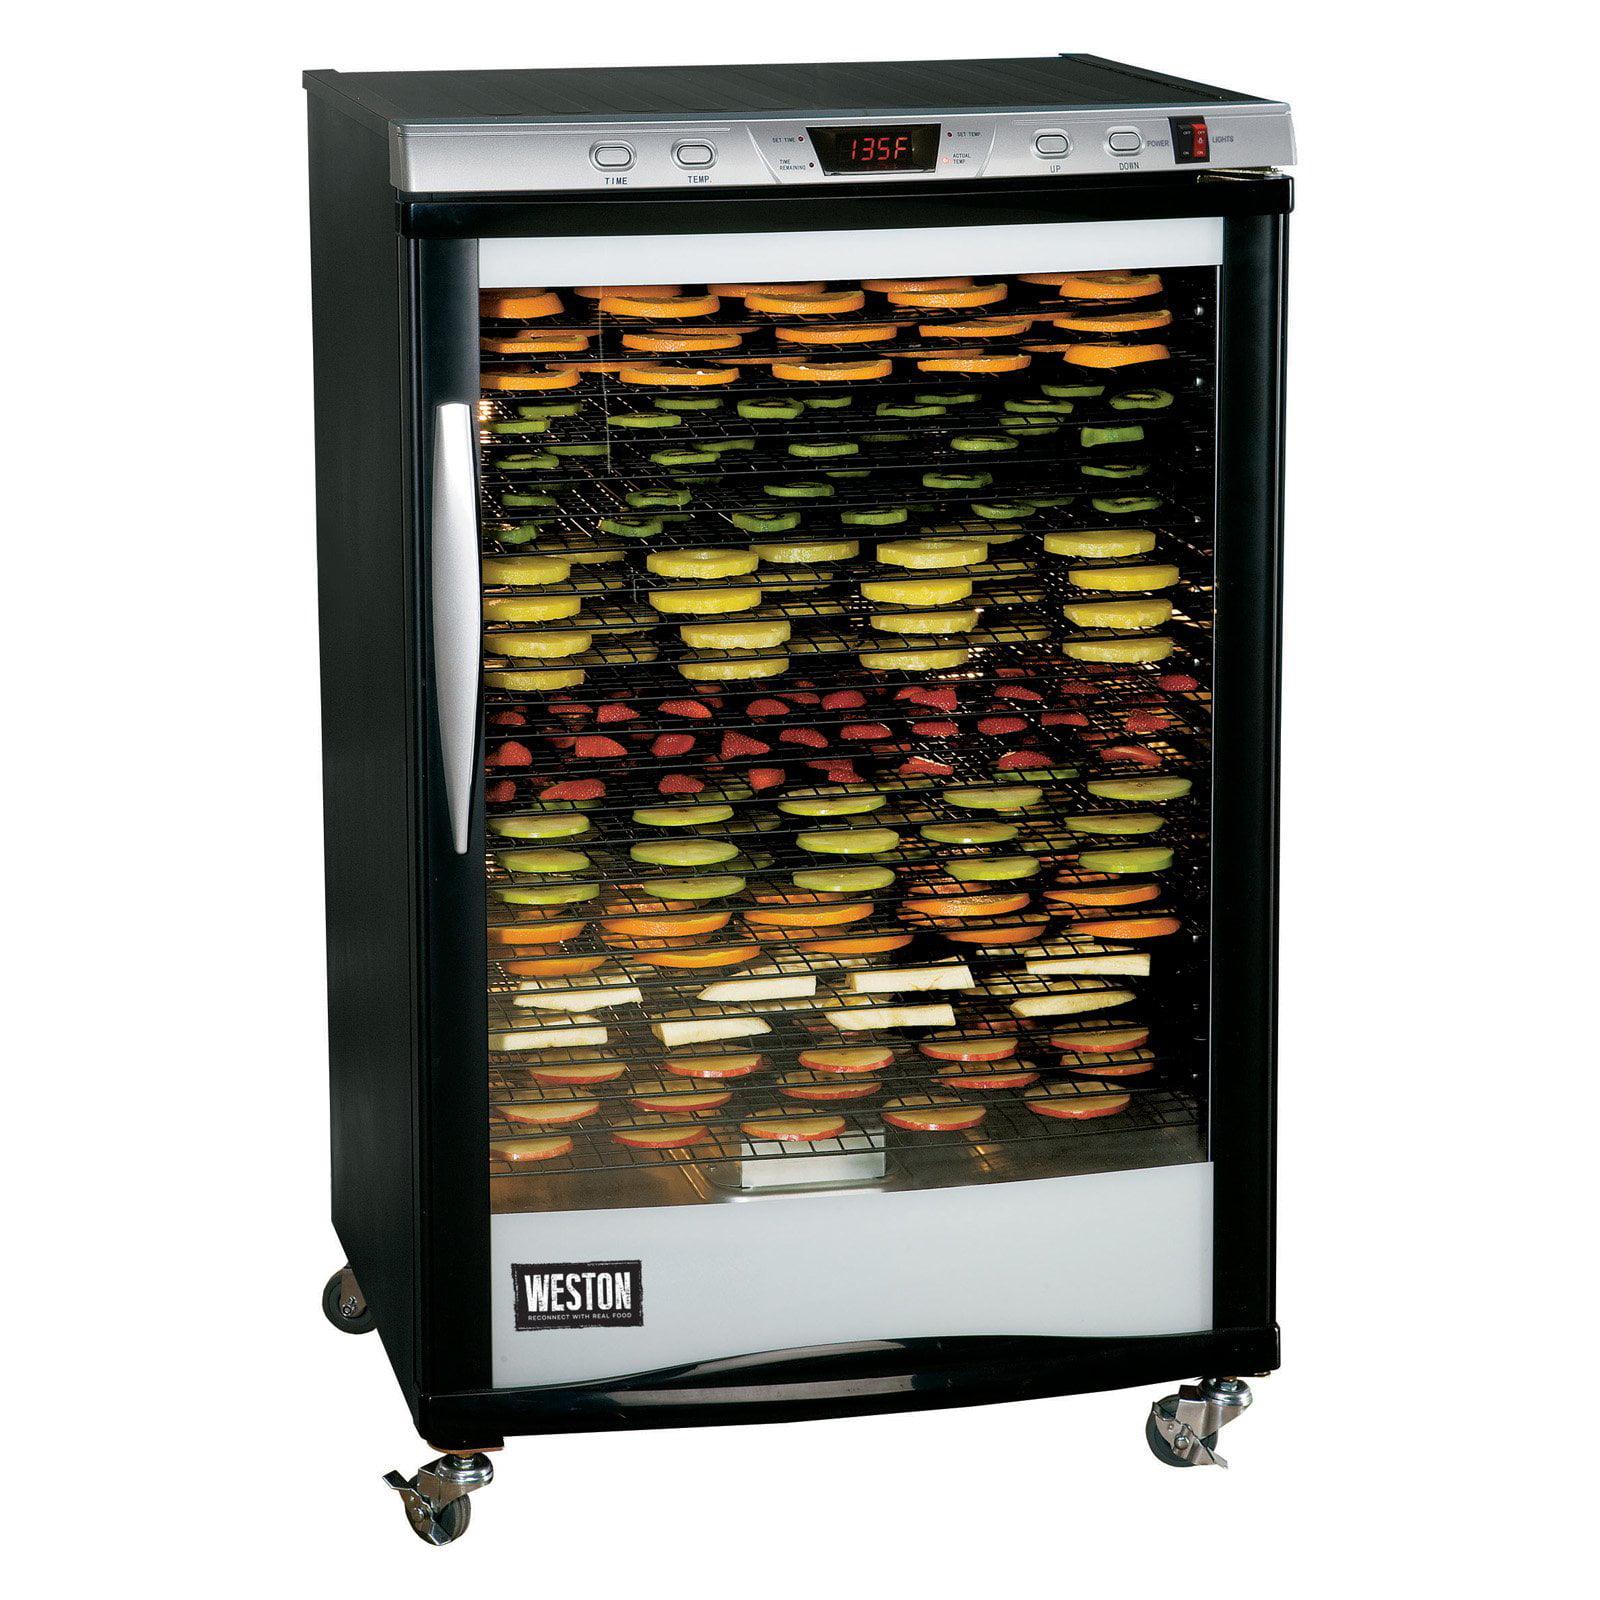 Weston Pro-2400 Digital Dehydrator - 160L - 24 Tray